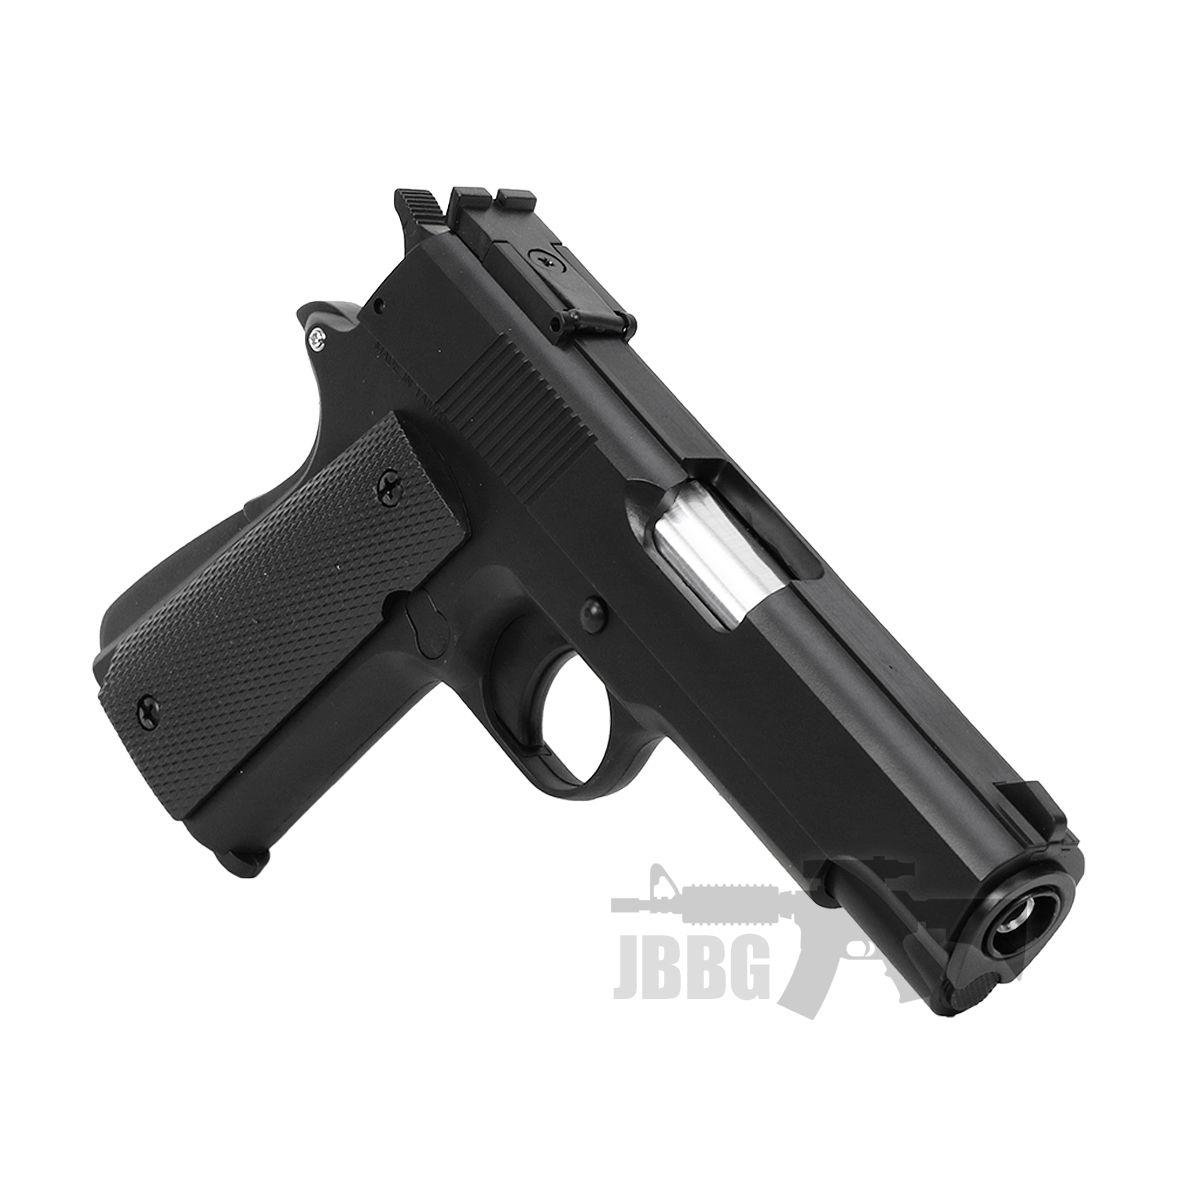 hg123 gas airsoft pistol 6